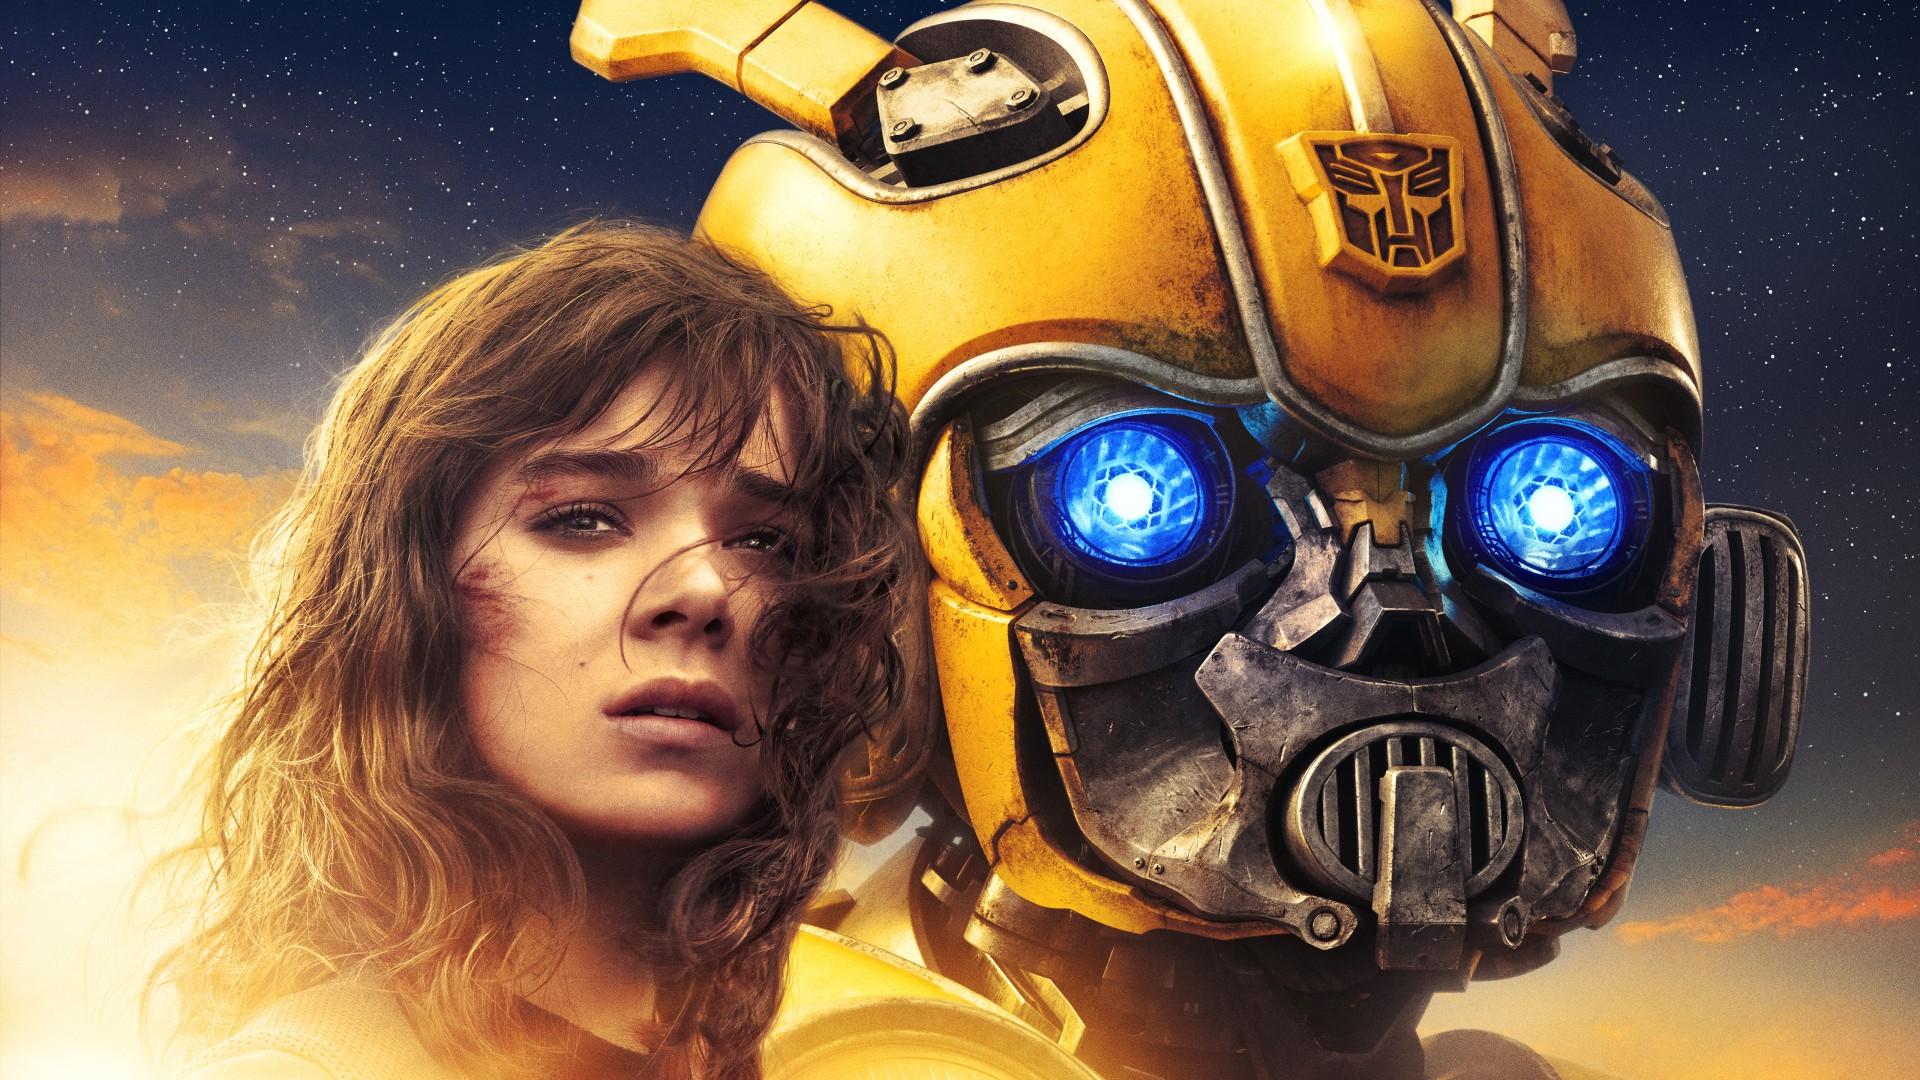 Transformers Wallpaper Hd Widescreen Bumblebee Movie 2018 5k Wallpapers Hd Wallpapers Id 26574